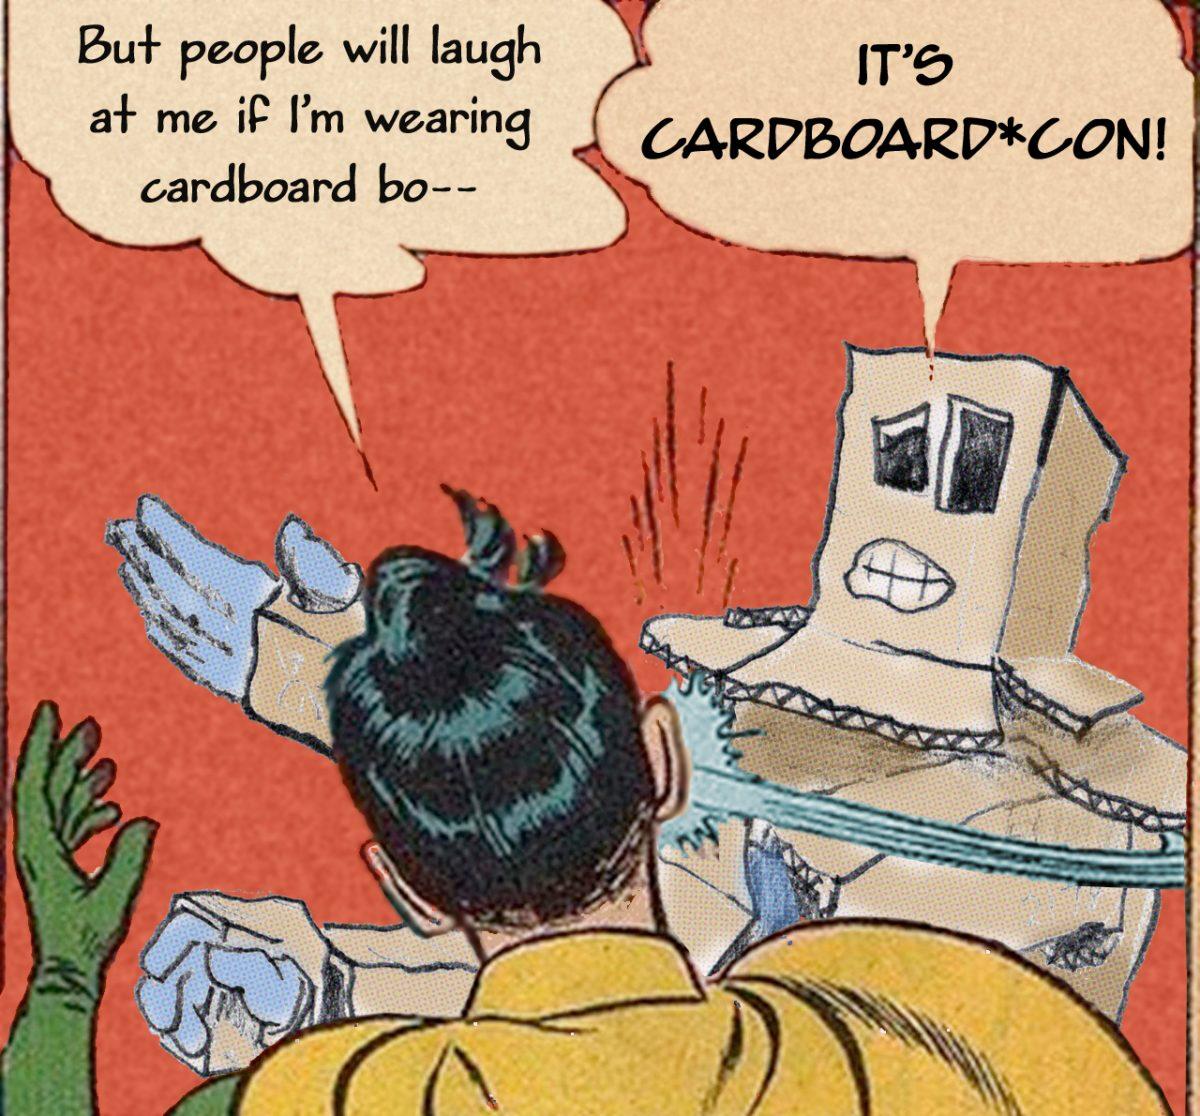 Holy cardboard Batman, it's Cardboard*Con!